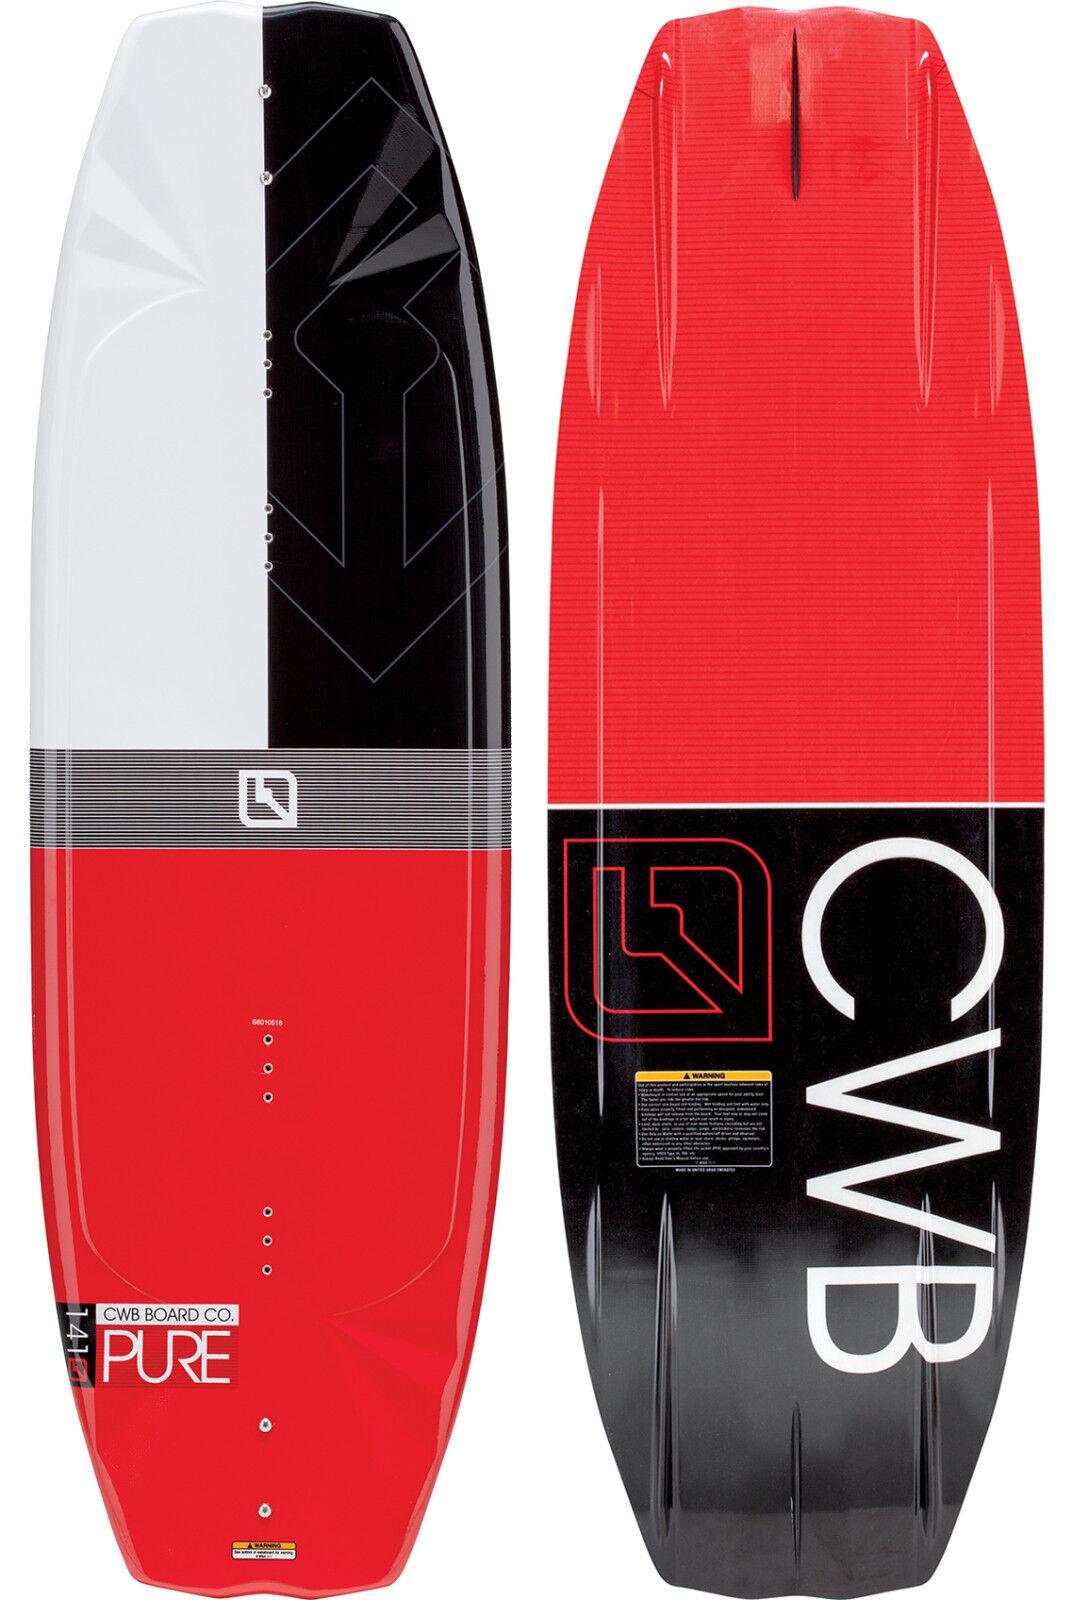 Cwb Tavoletta Co. Pura Uomo Uomo Uomo Utente Friendly Wakeboard 141cm Bianca Nera Rossa 268585